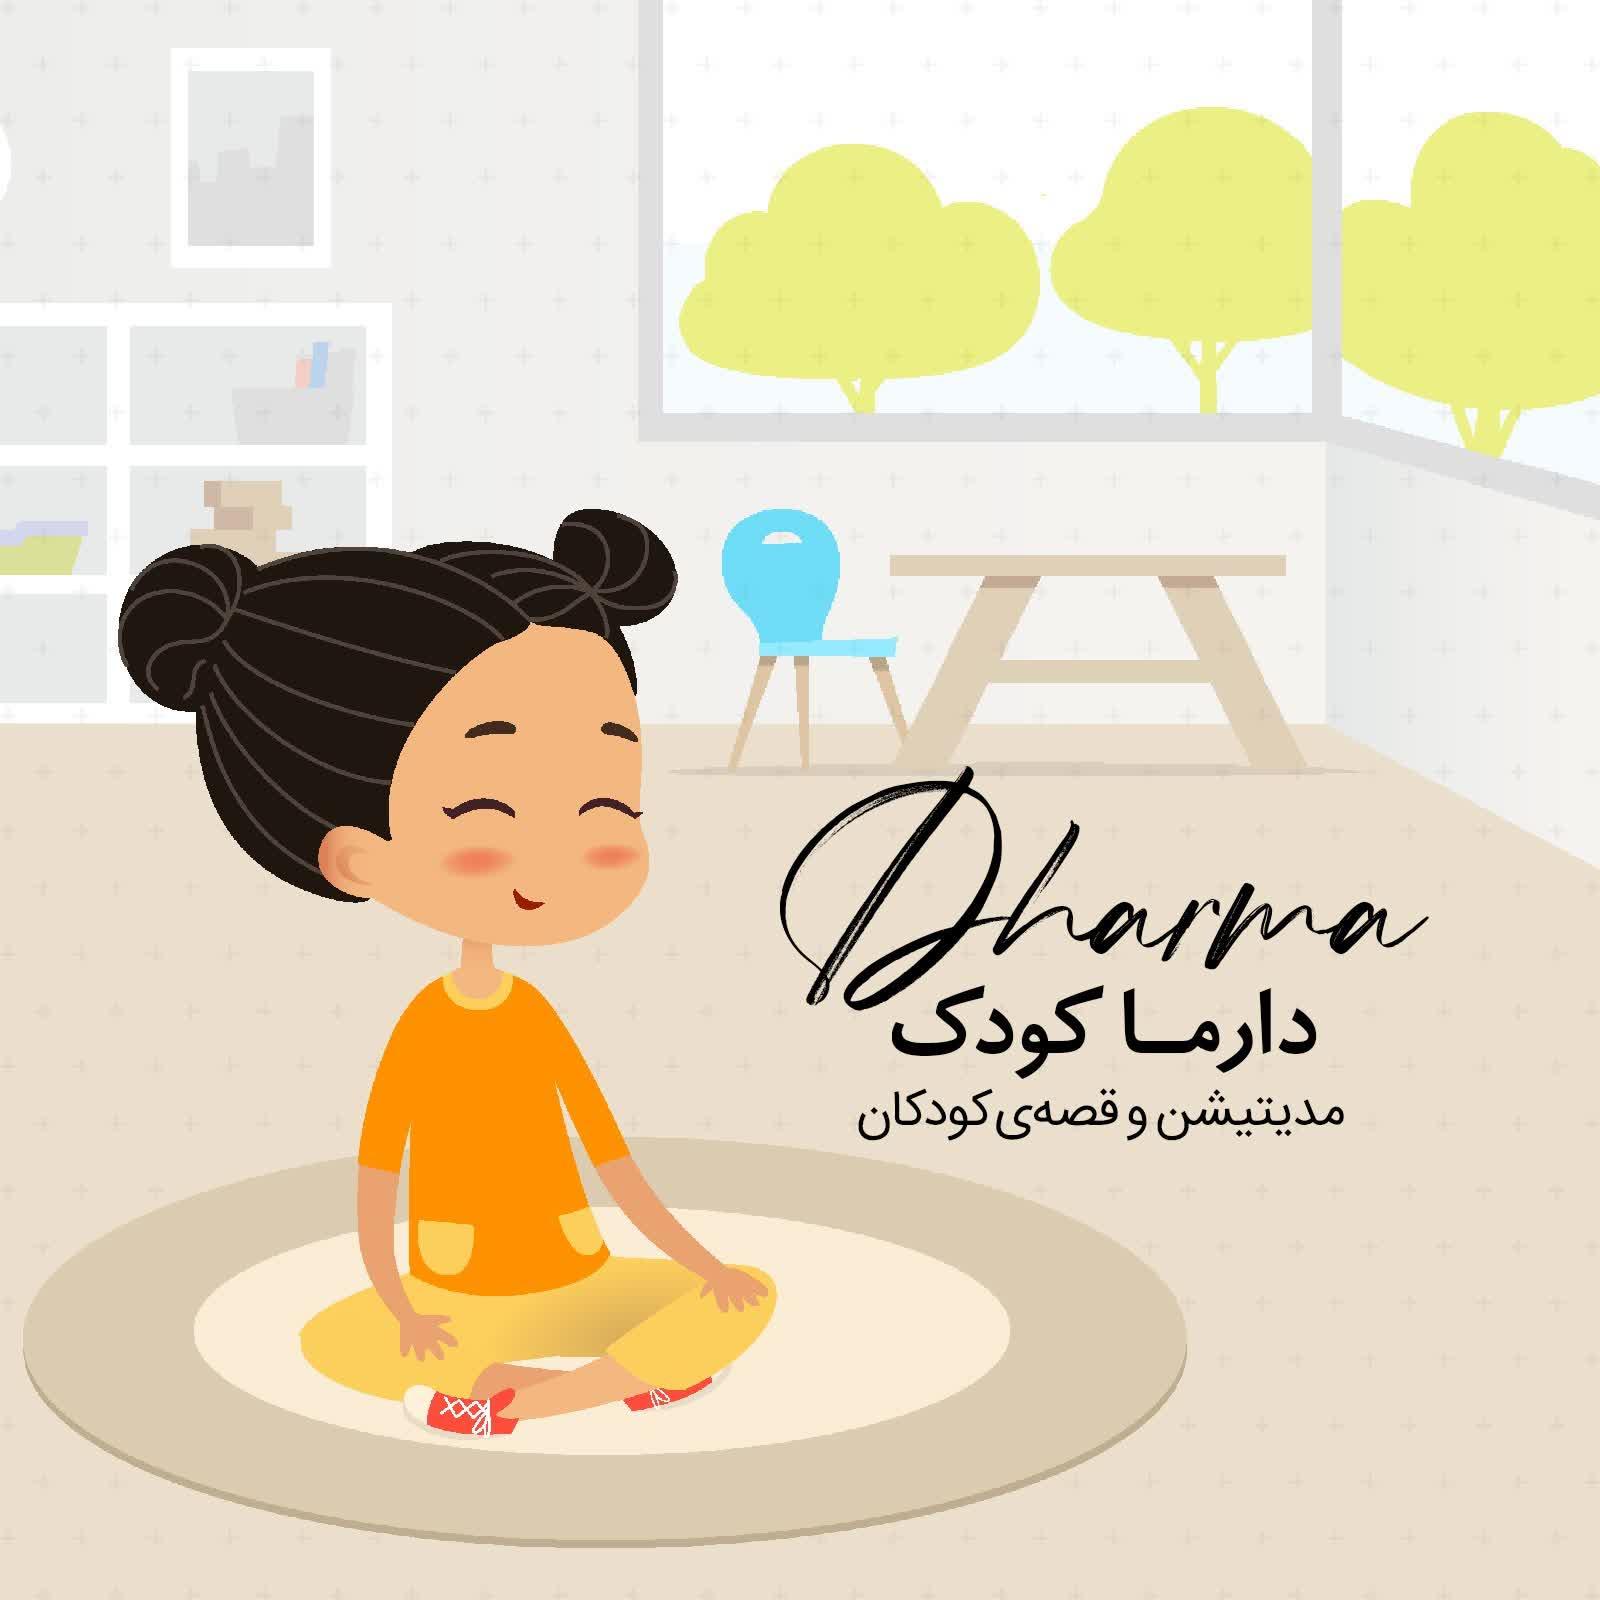 دارما کودک، پادکست مدیتیشن و قصهی کودکان | Dharma Kids, Meditation And Stories For Children